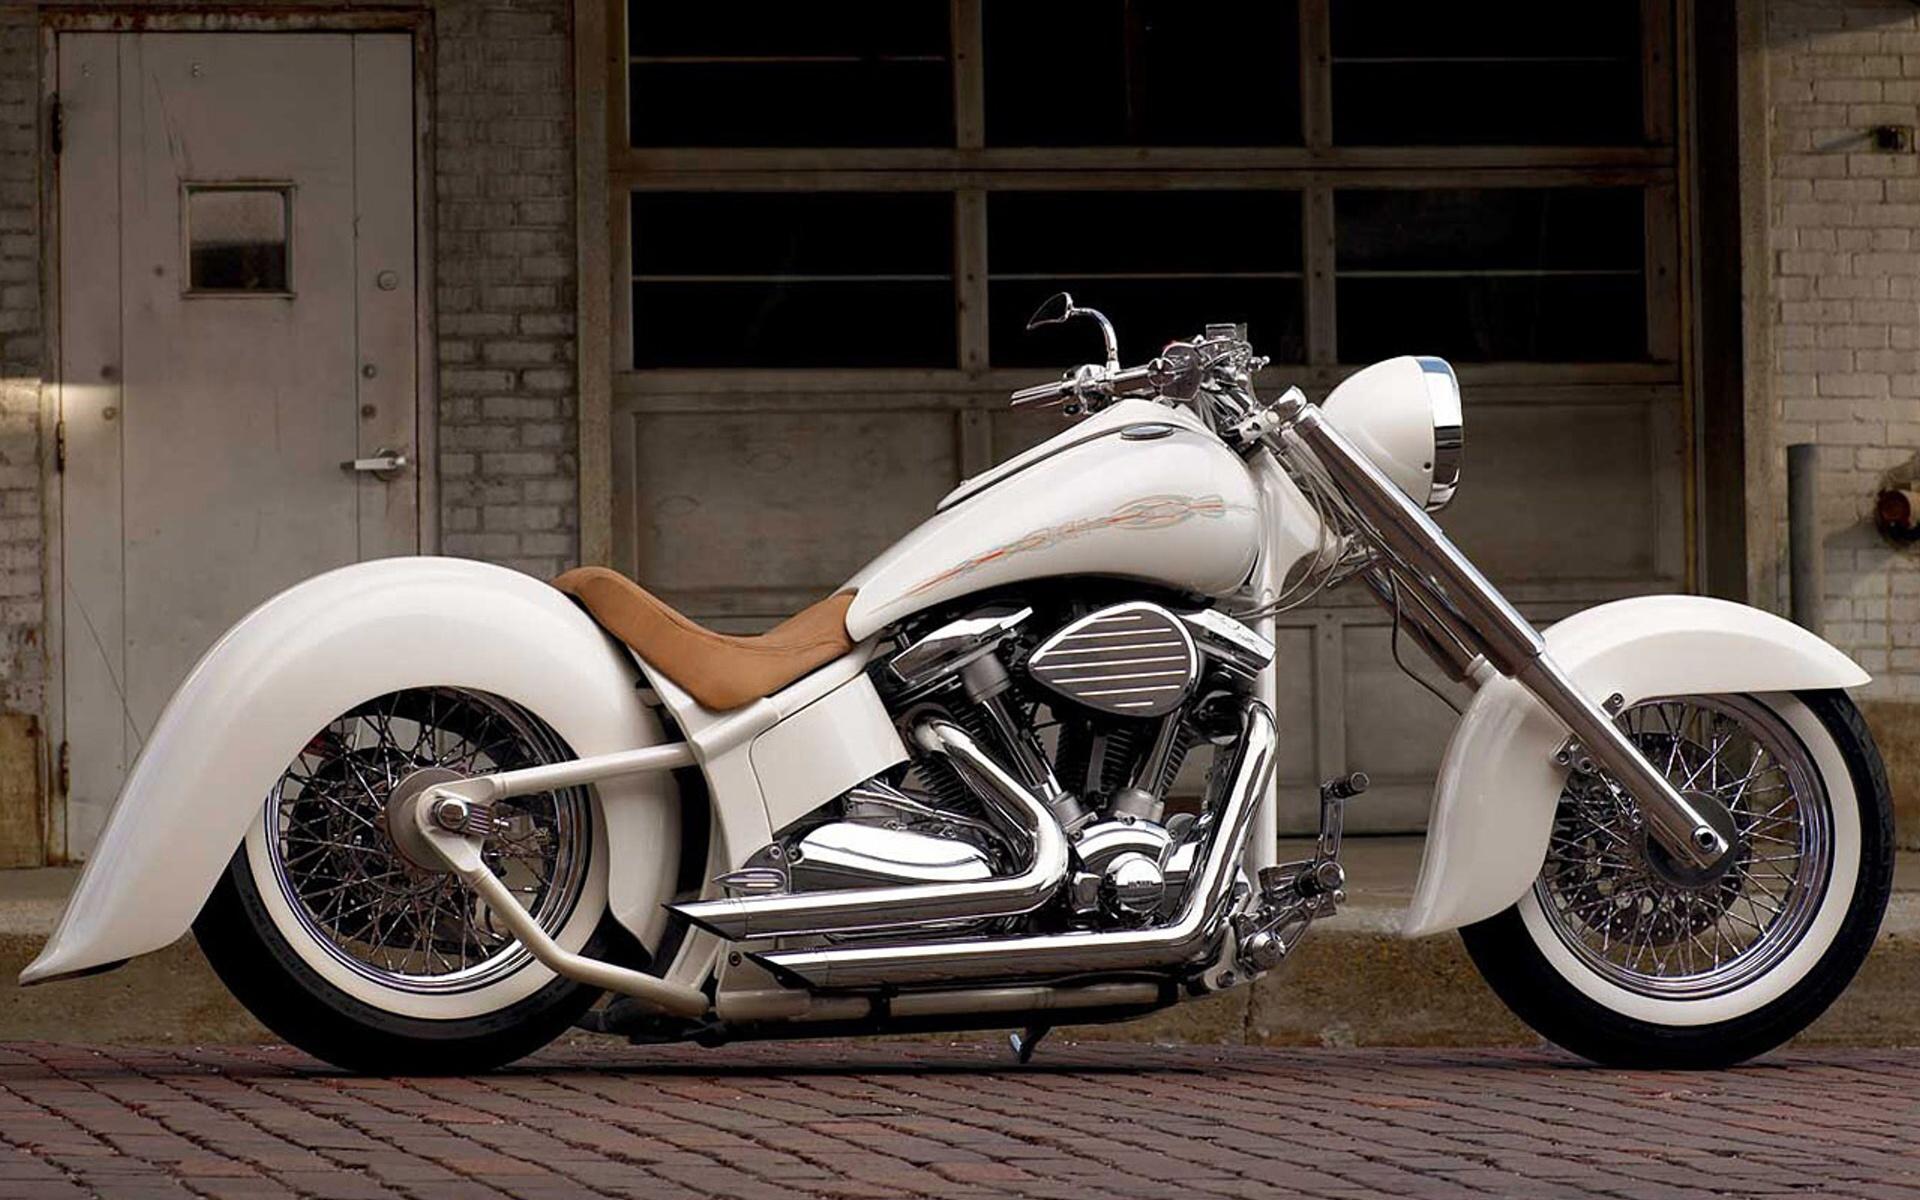 когда-то ретро мотоциклы картинки менее